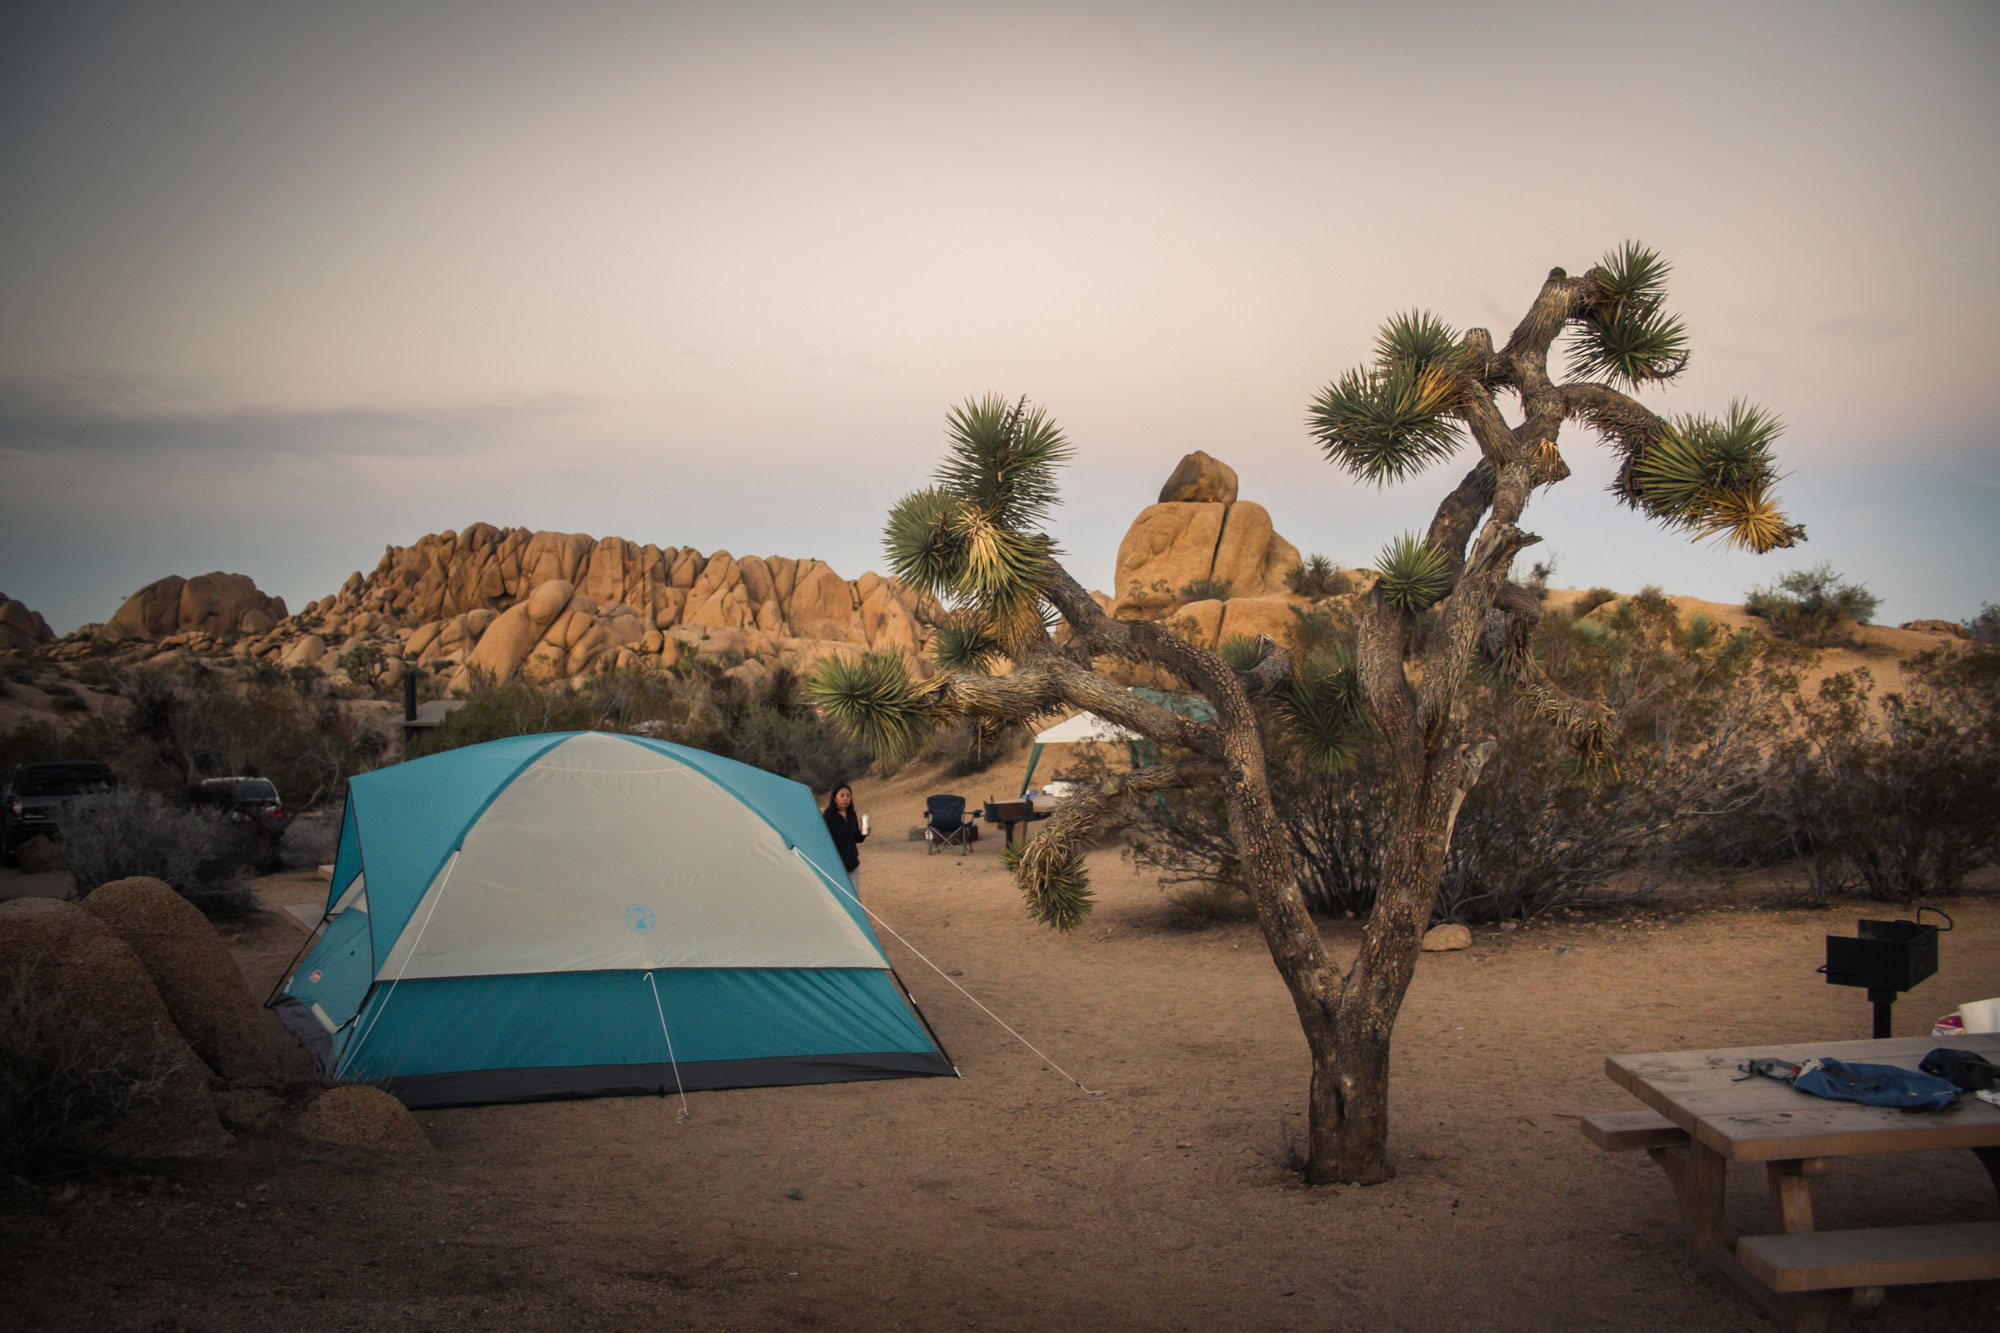 Campsite in Joshua Tree National Park.jpg